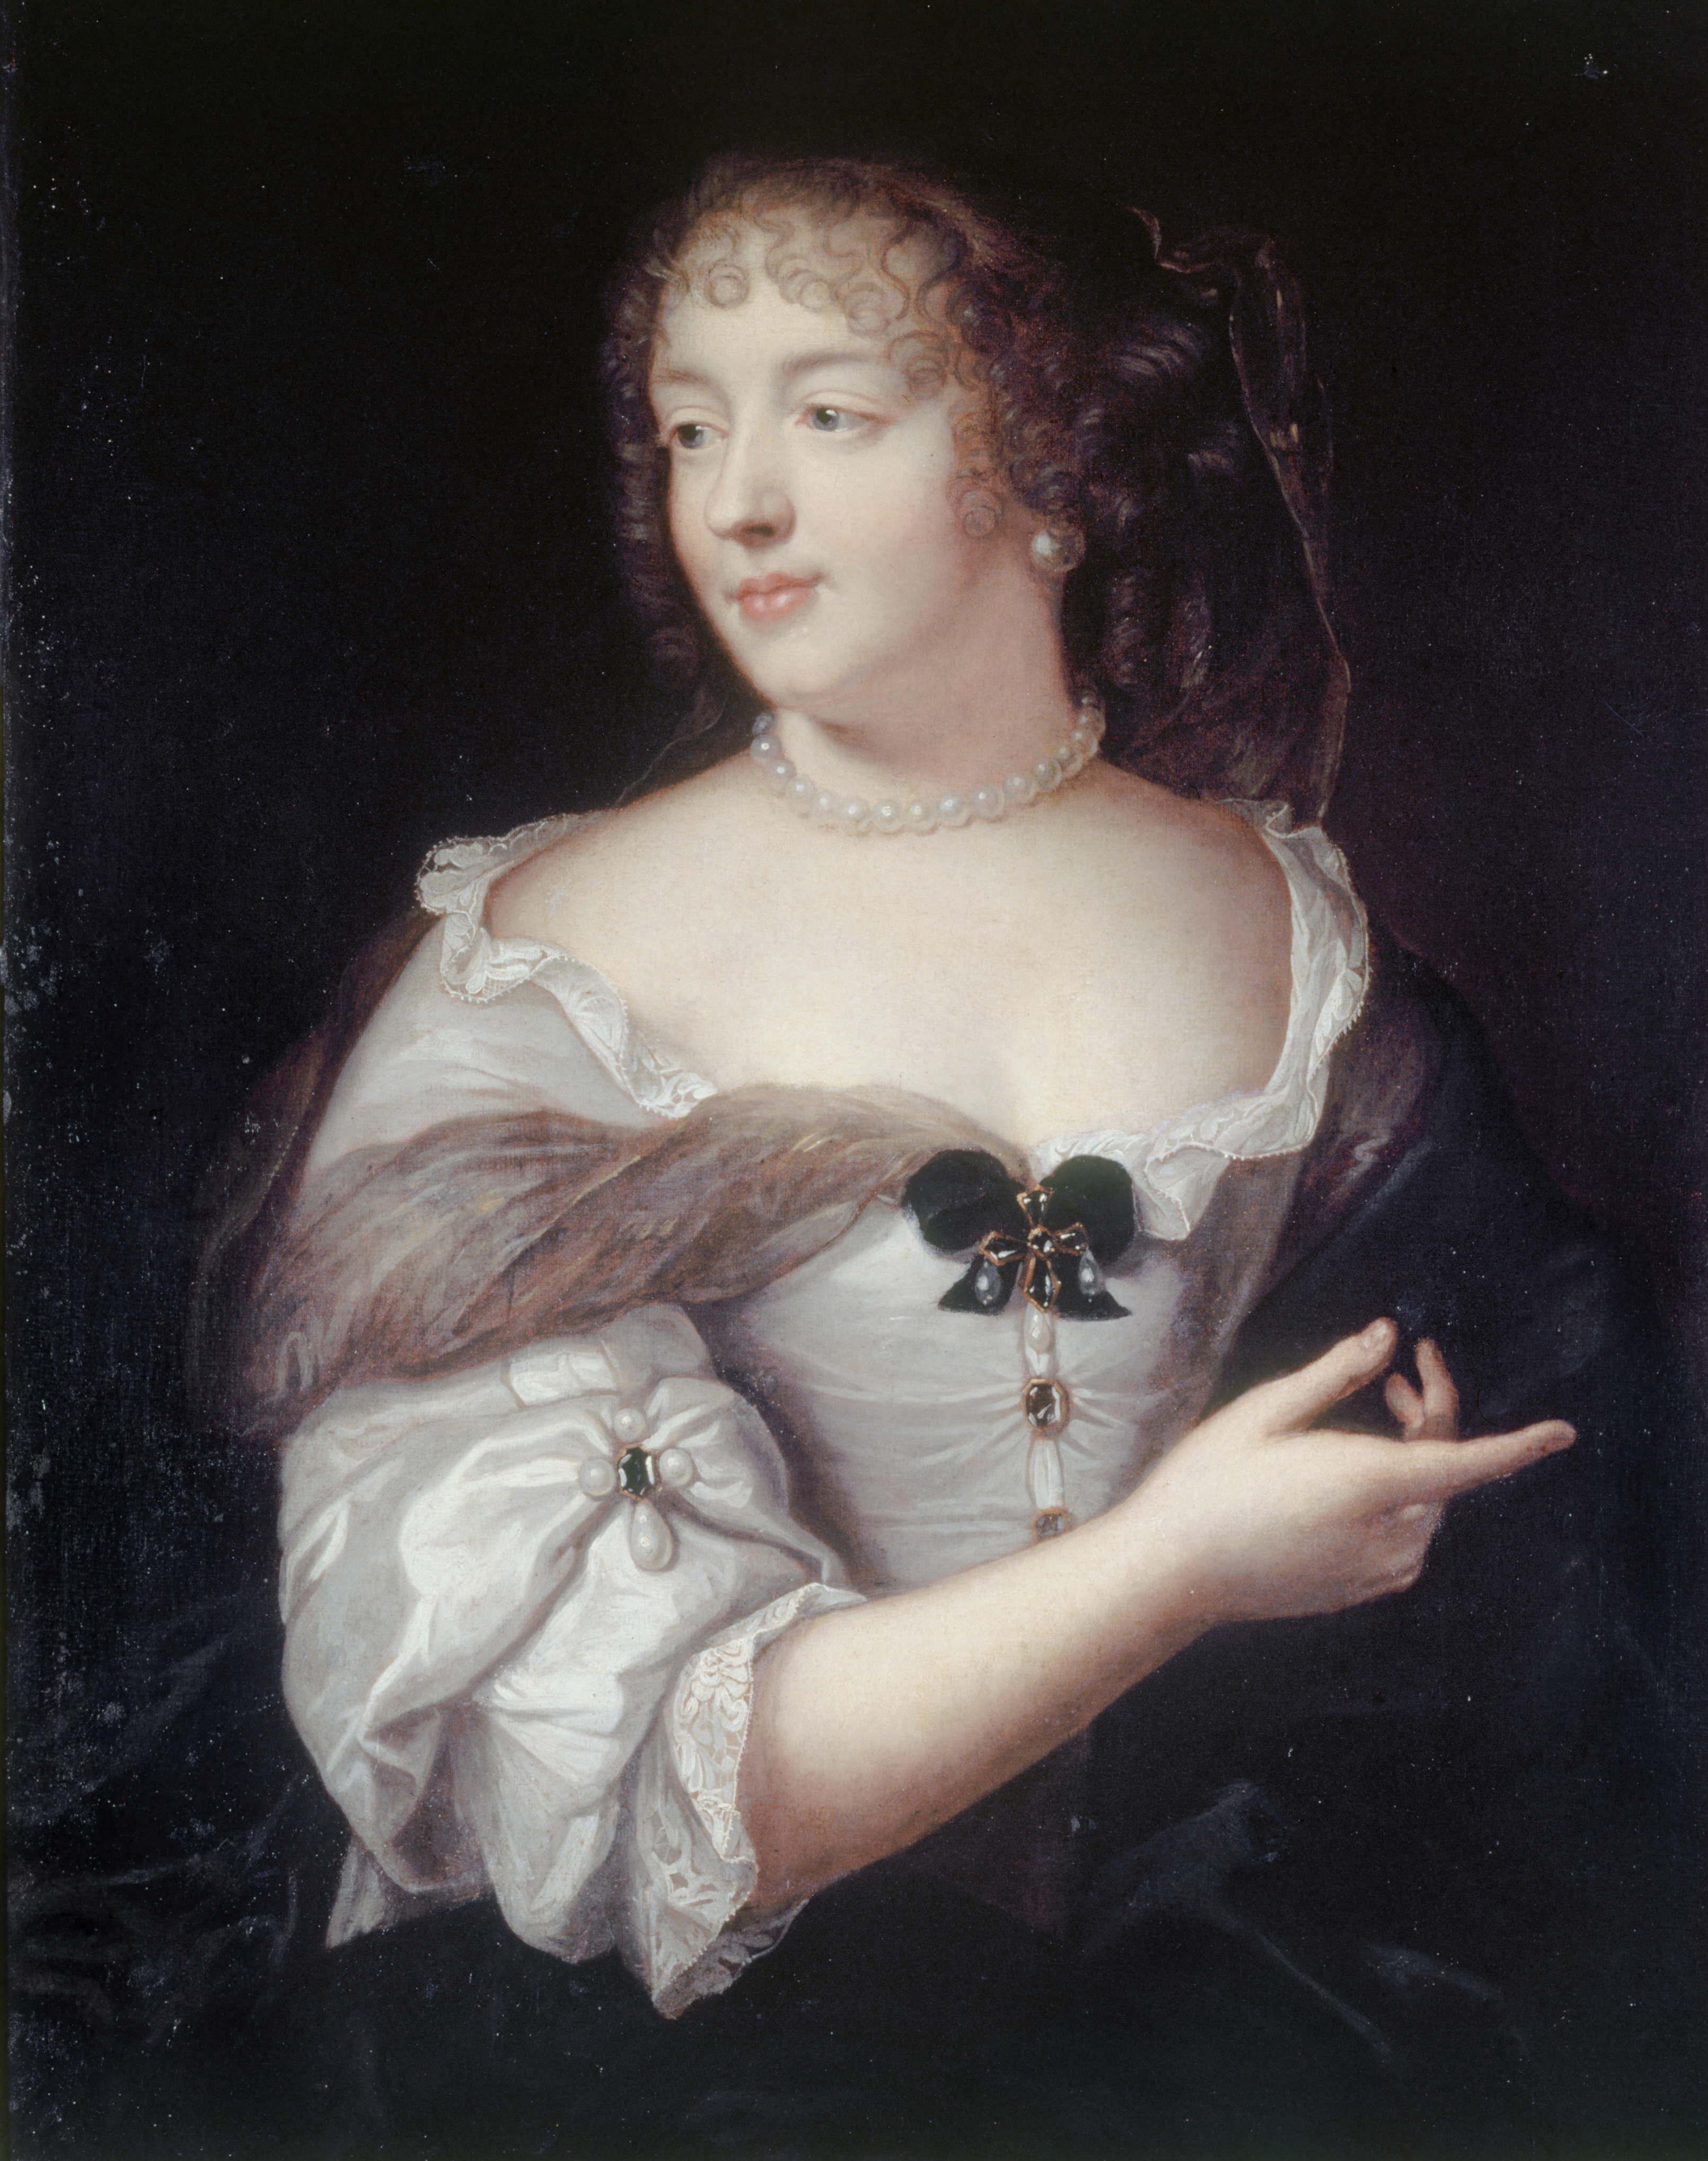 File:Marquise de sevignee.jpg